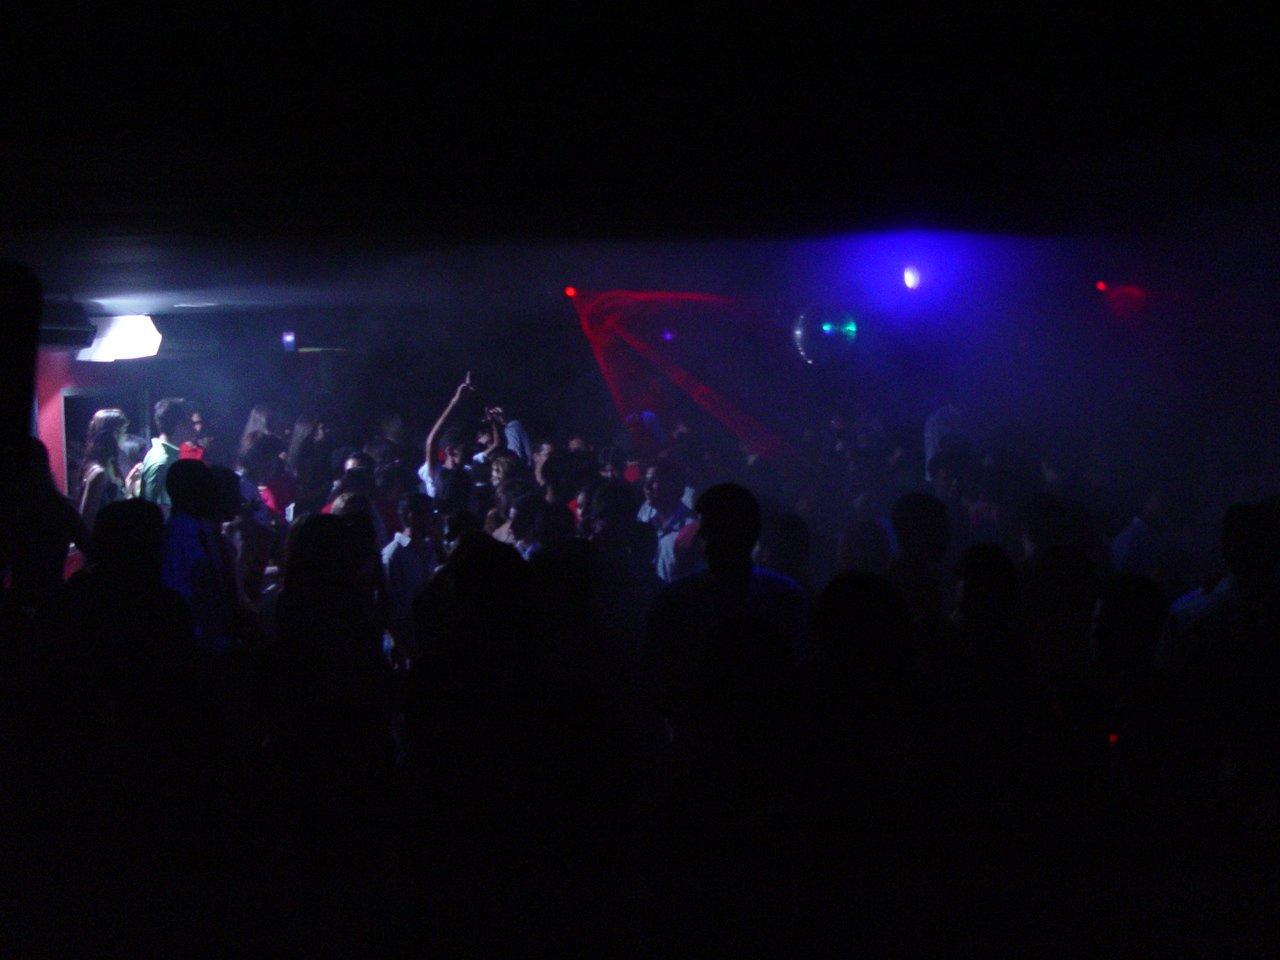 Free boate disco night club stock photo for Disco night club